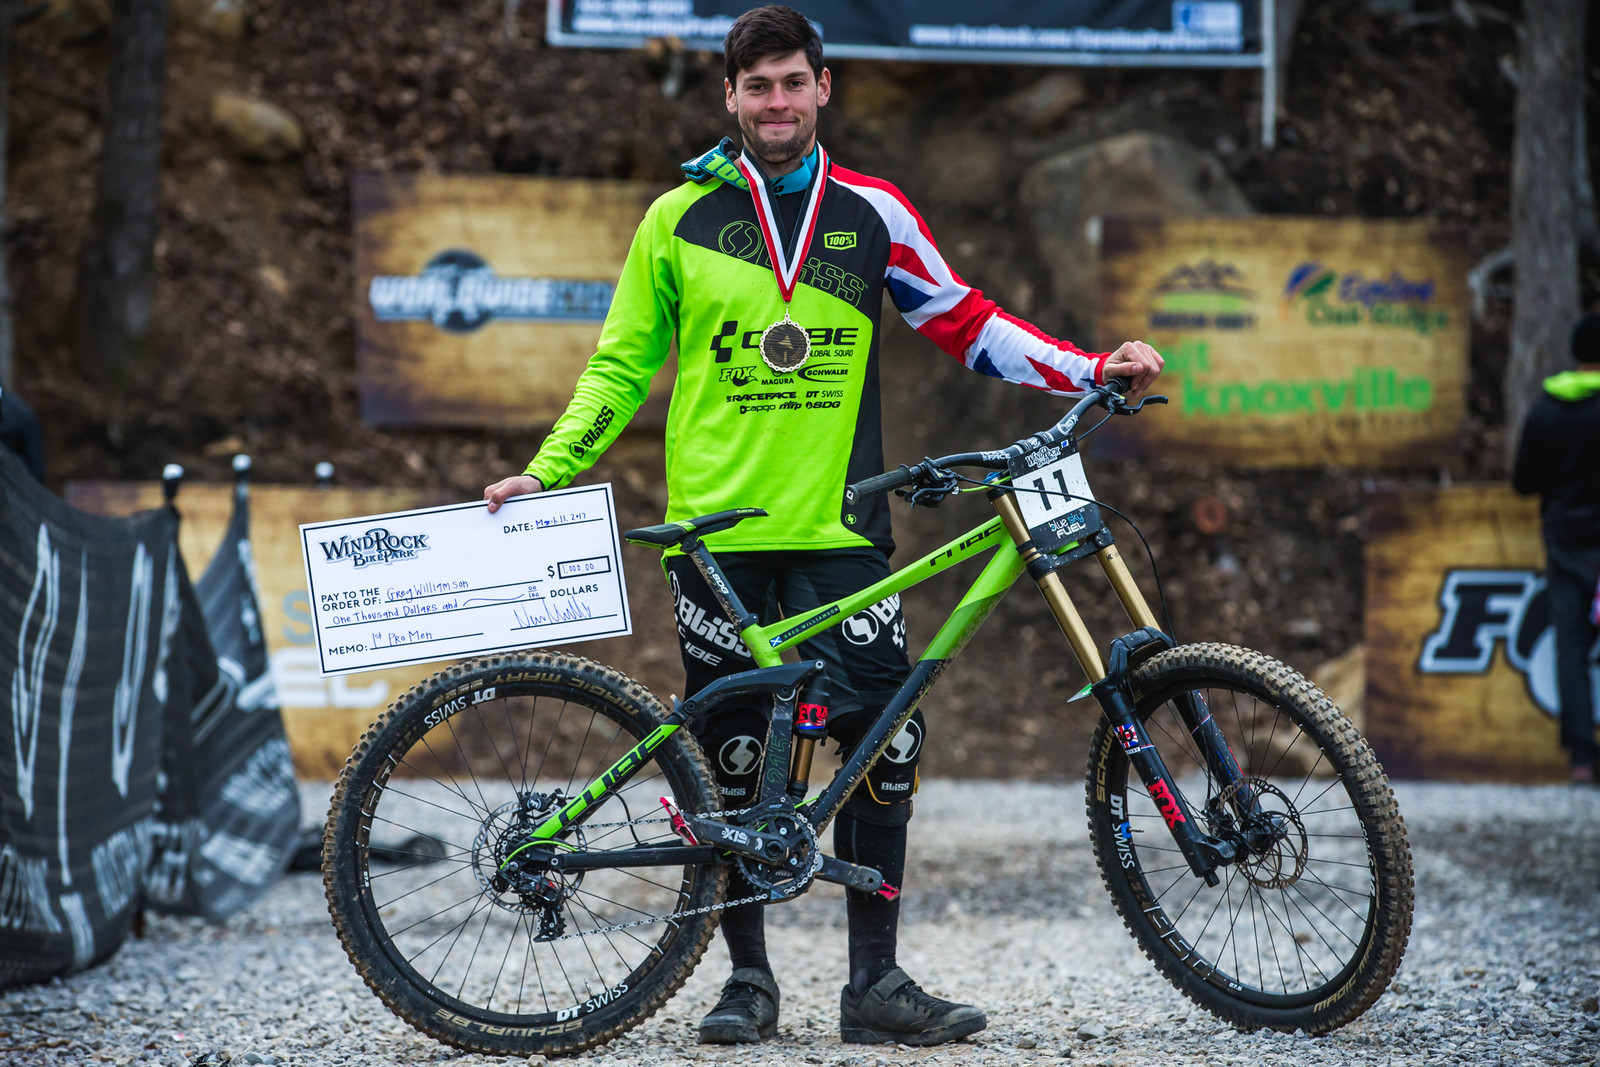 WINNER'S CIRCLE Pro GRT Windrock - Greg Williamson with his Cube TWO15 - WINNER'S CIRCLE - Pro GRT Windrock - Mountain Biking Pictures - Vital MTB